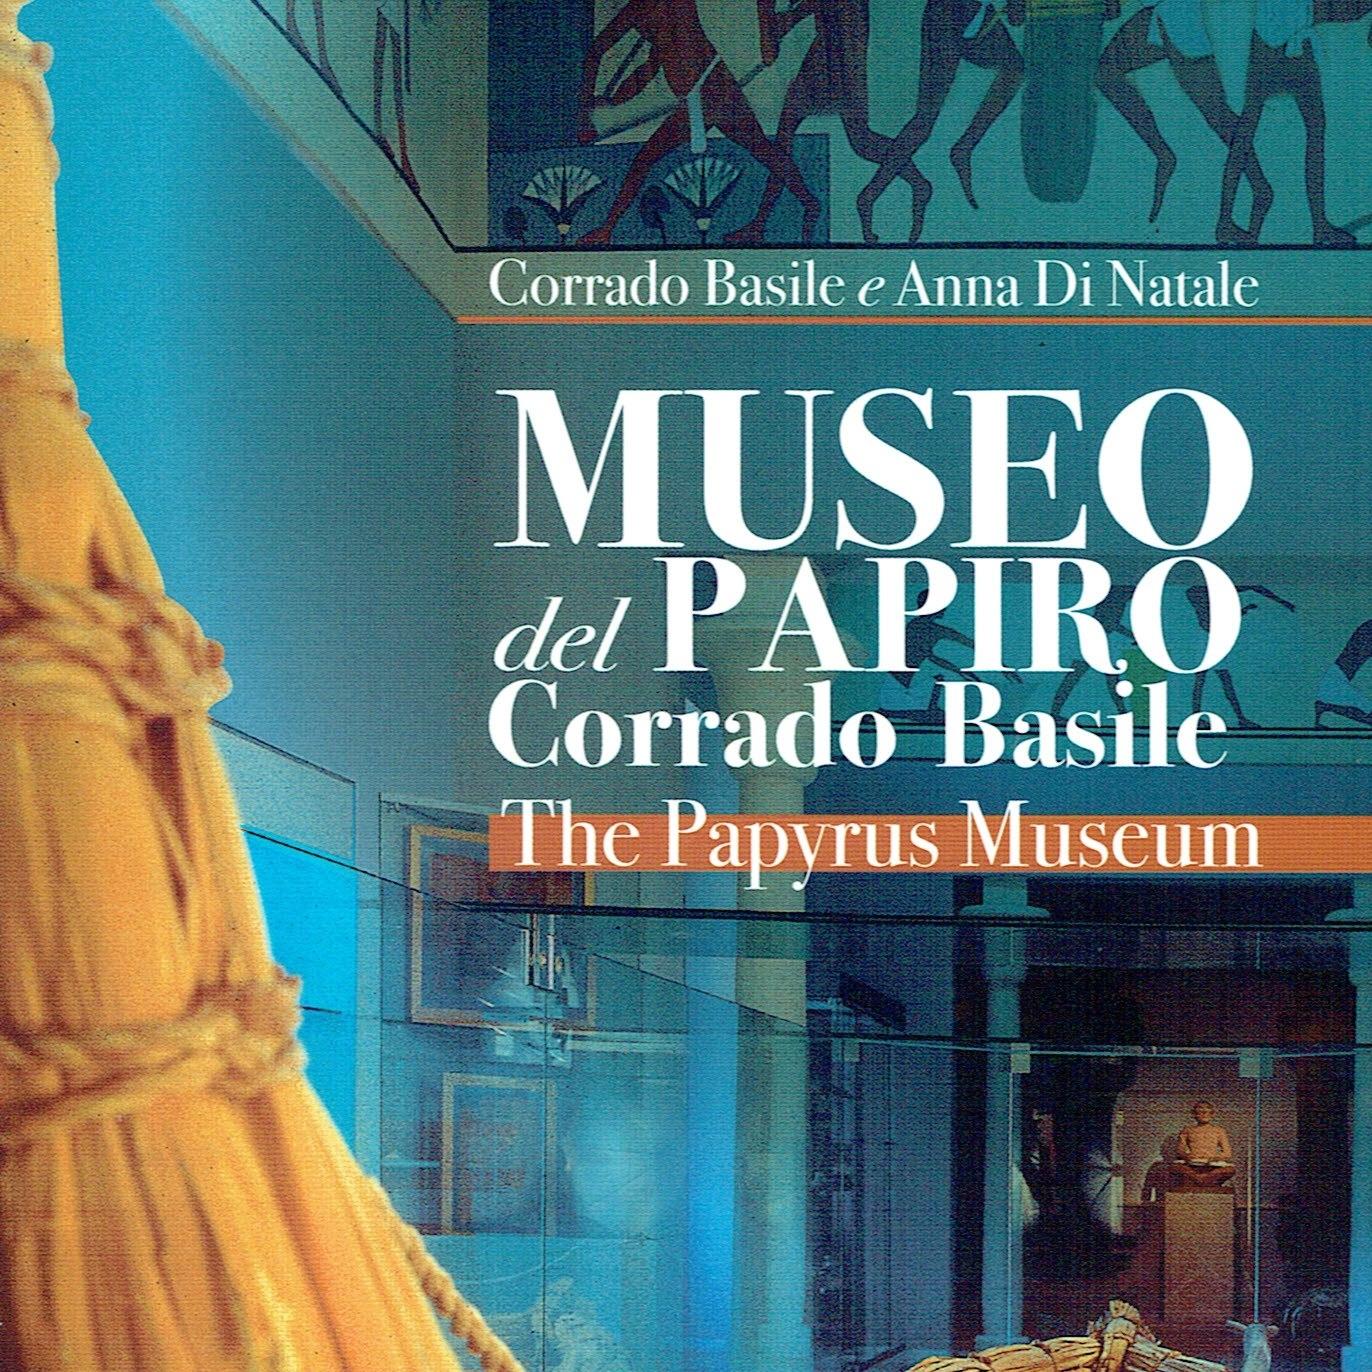 2015-monografie-del-museo-del-papiro-7-1579711197.jpg